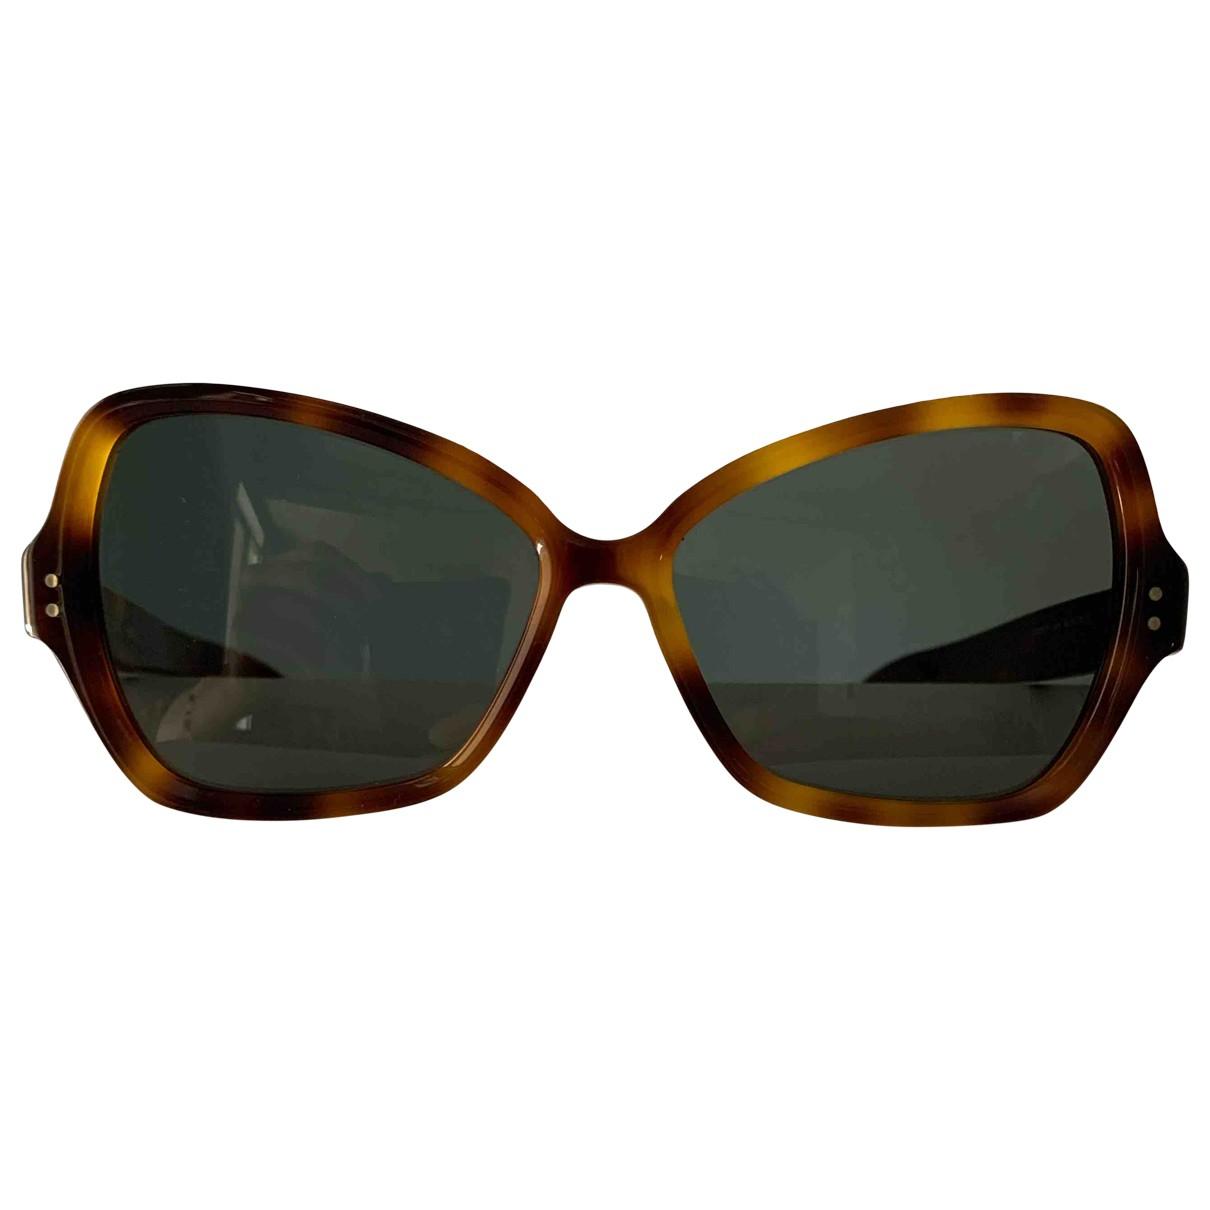 Gafas Tilda Celine